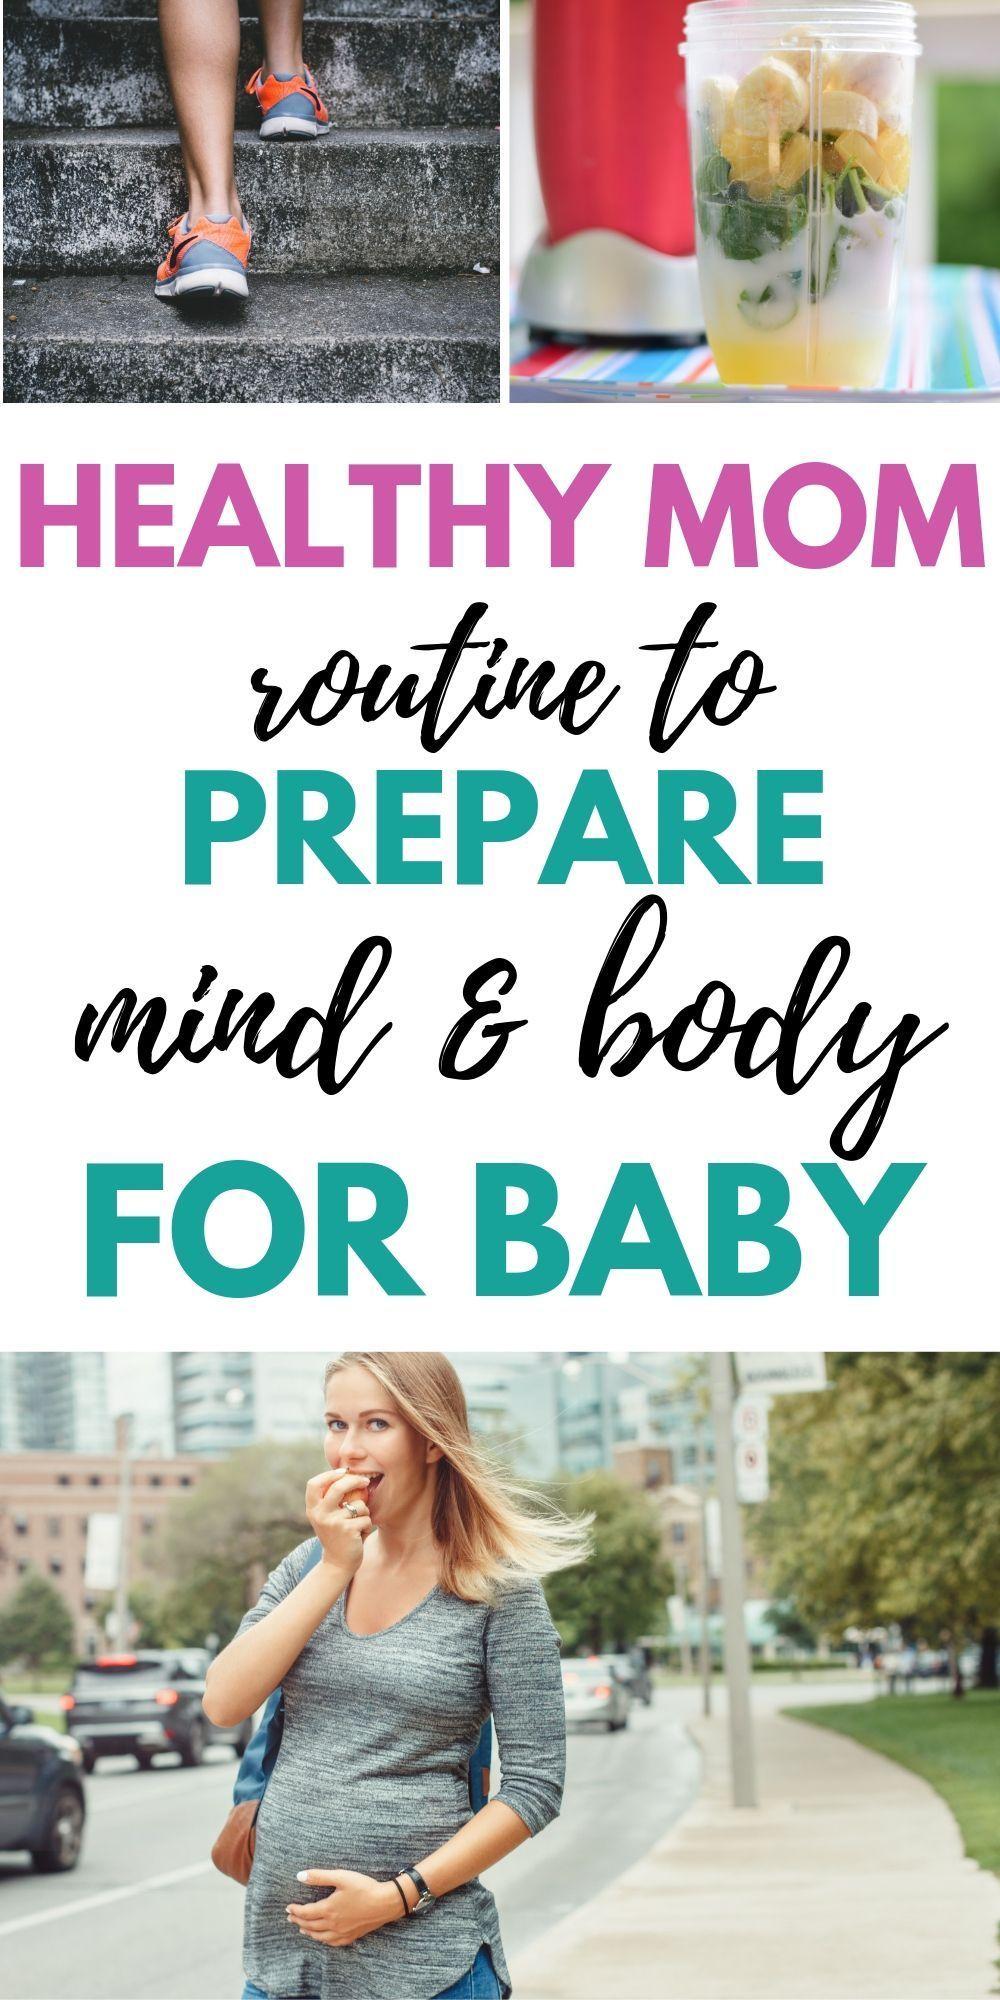 Pin on best pregnancy advice